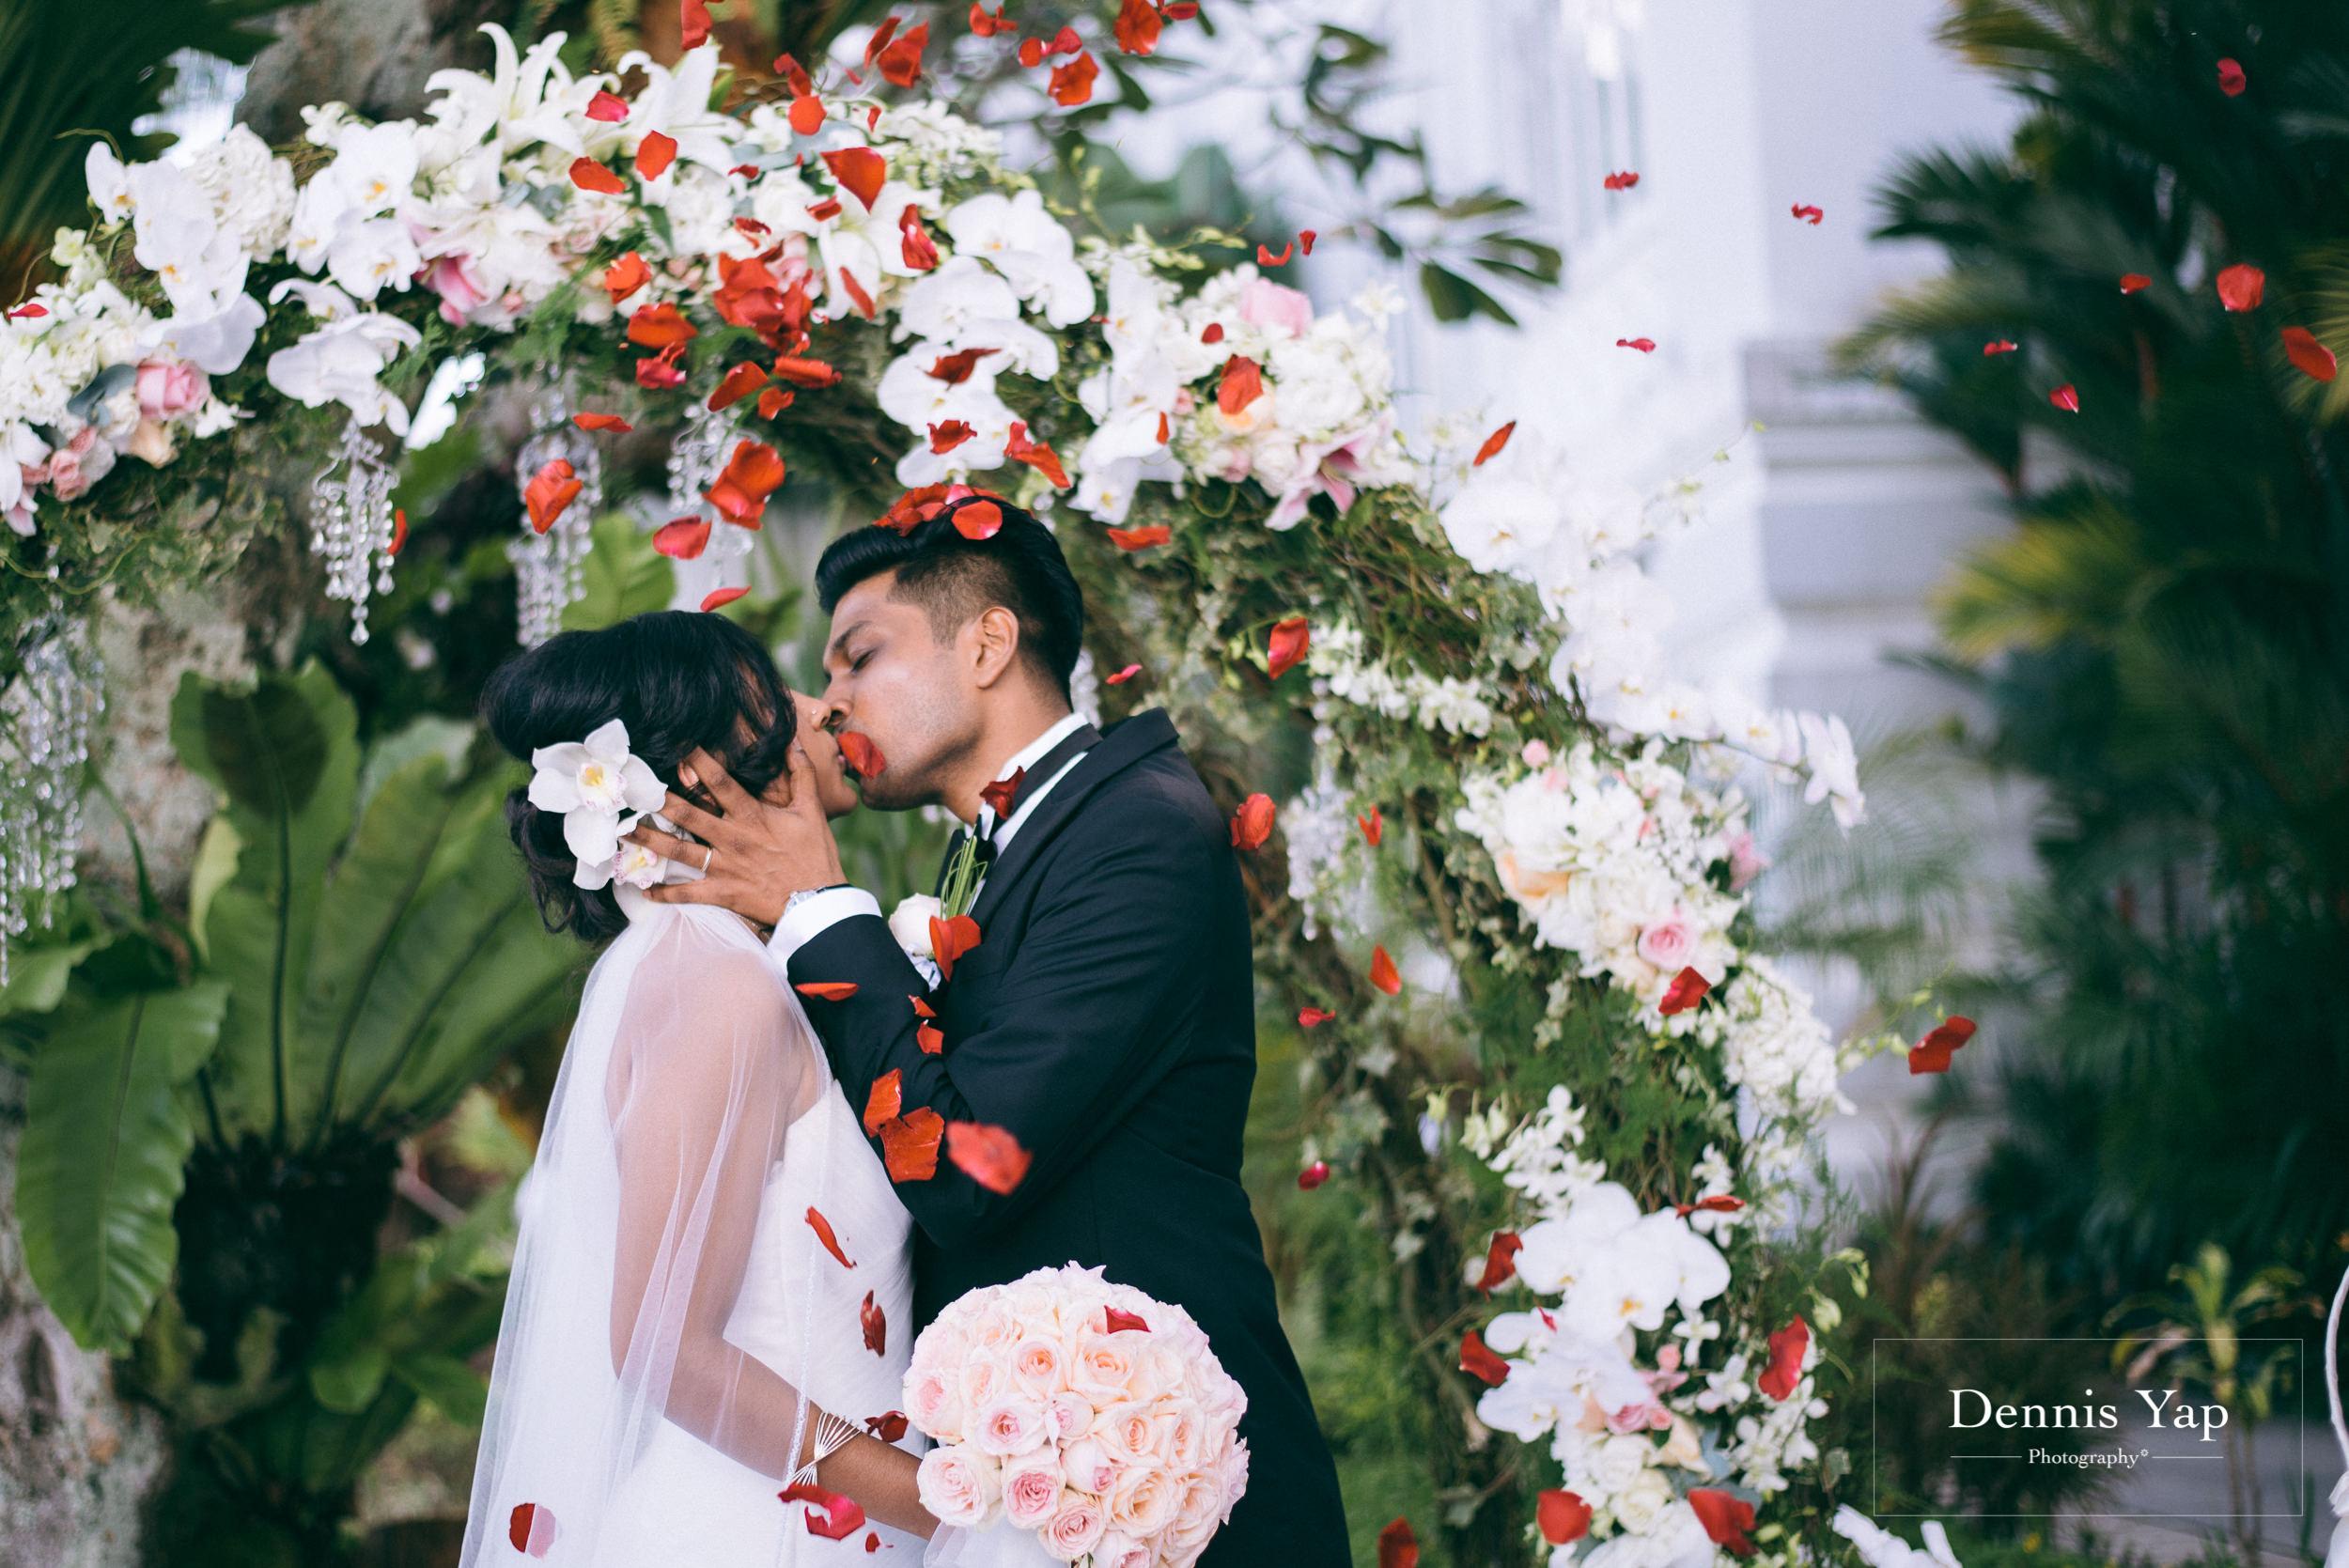 kelvin kosyilya garden wedding penang E and O hotel dennis yap indian wedding photographer-19.jpg